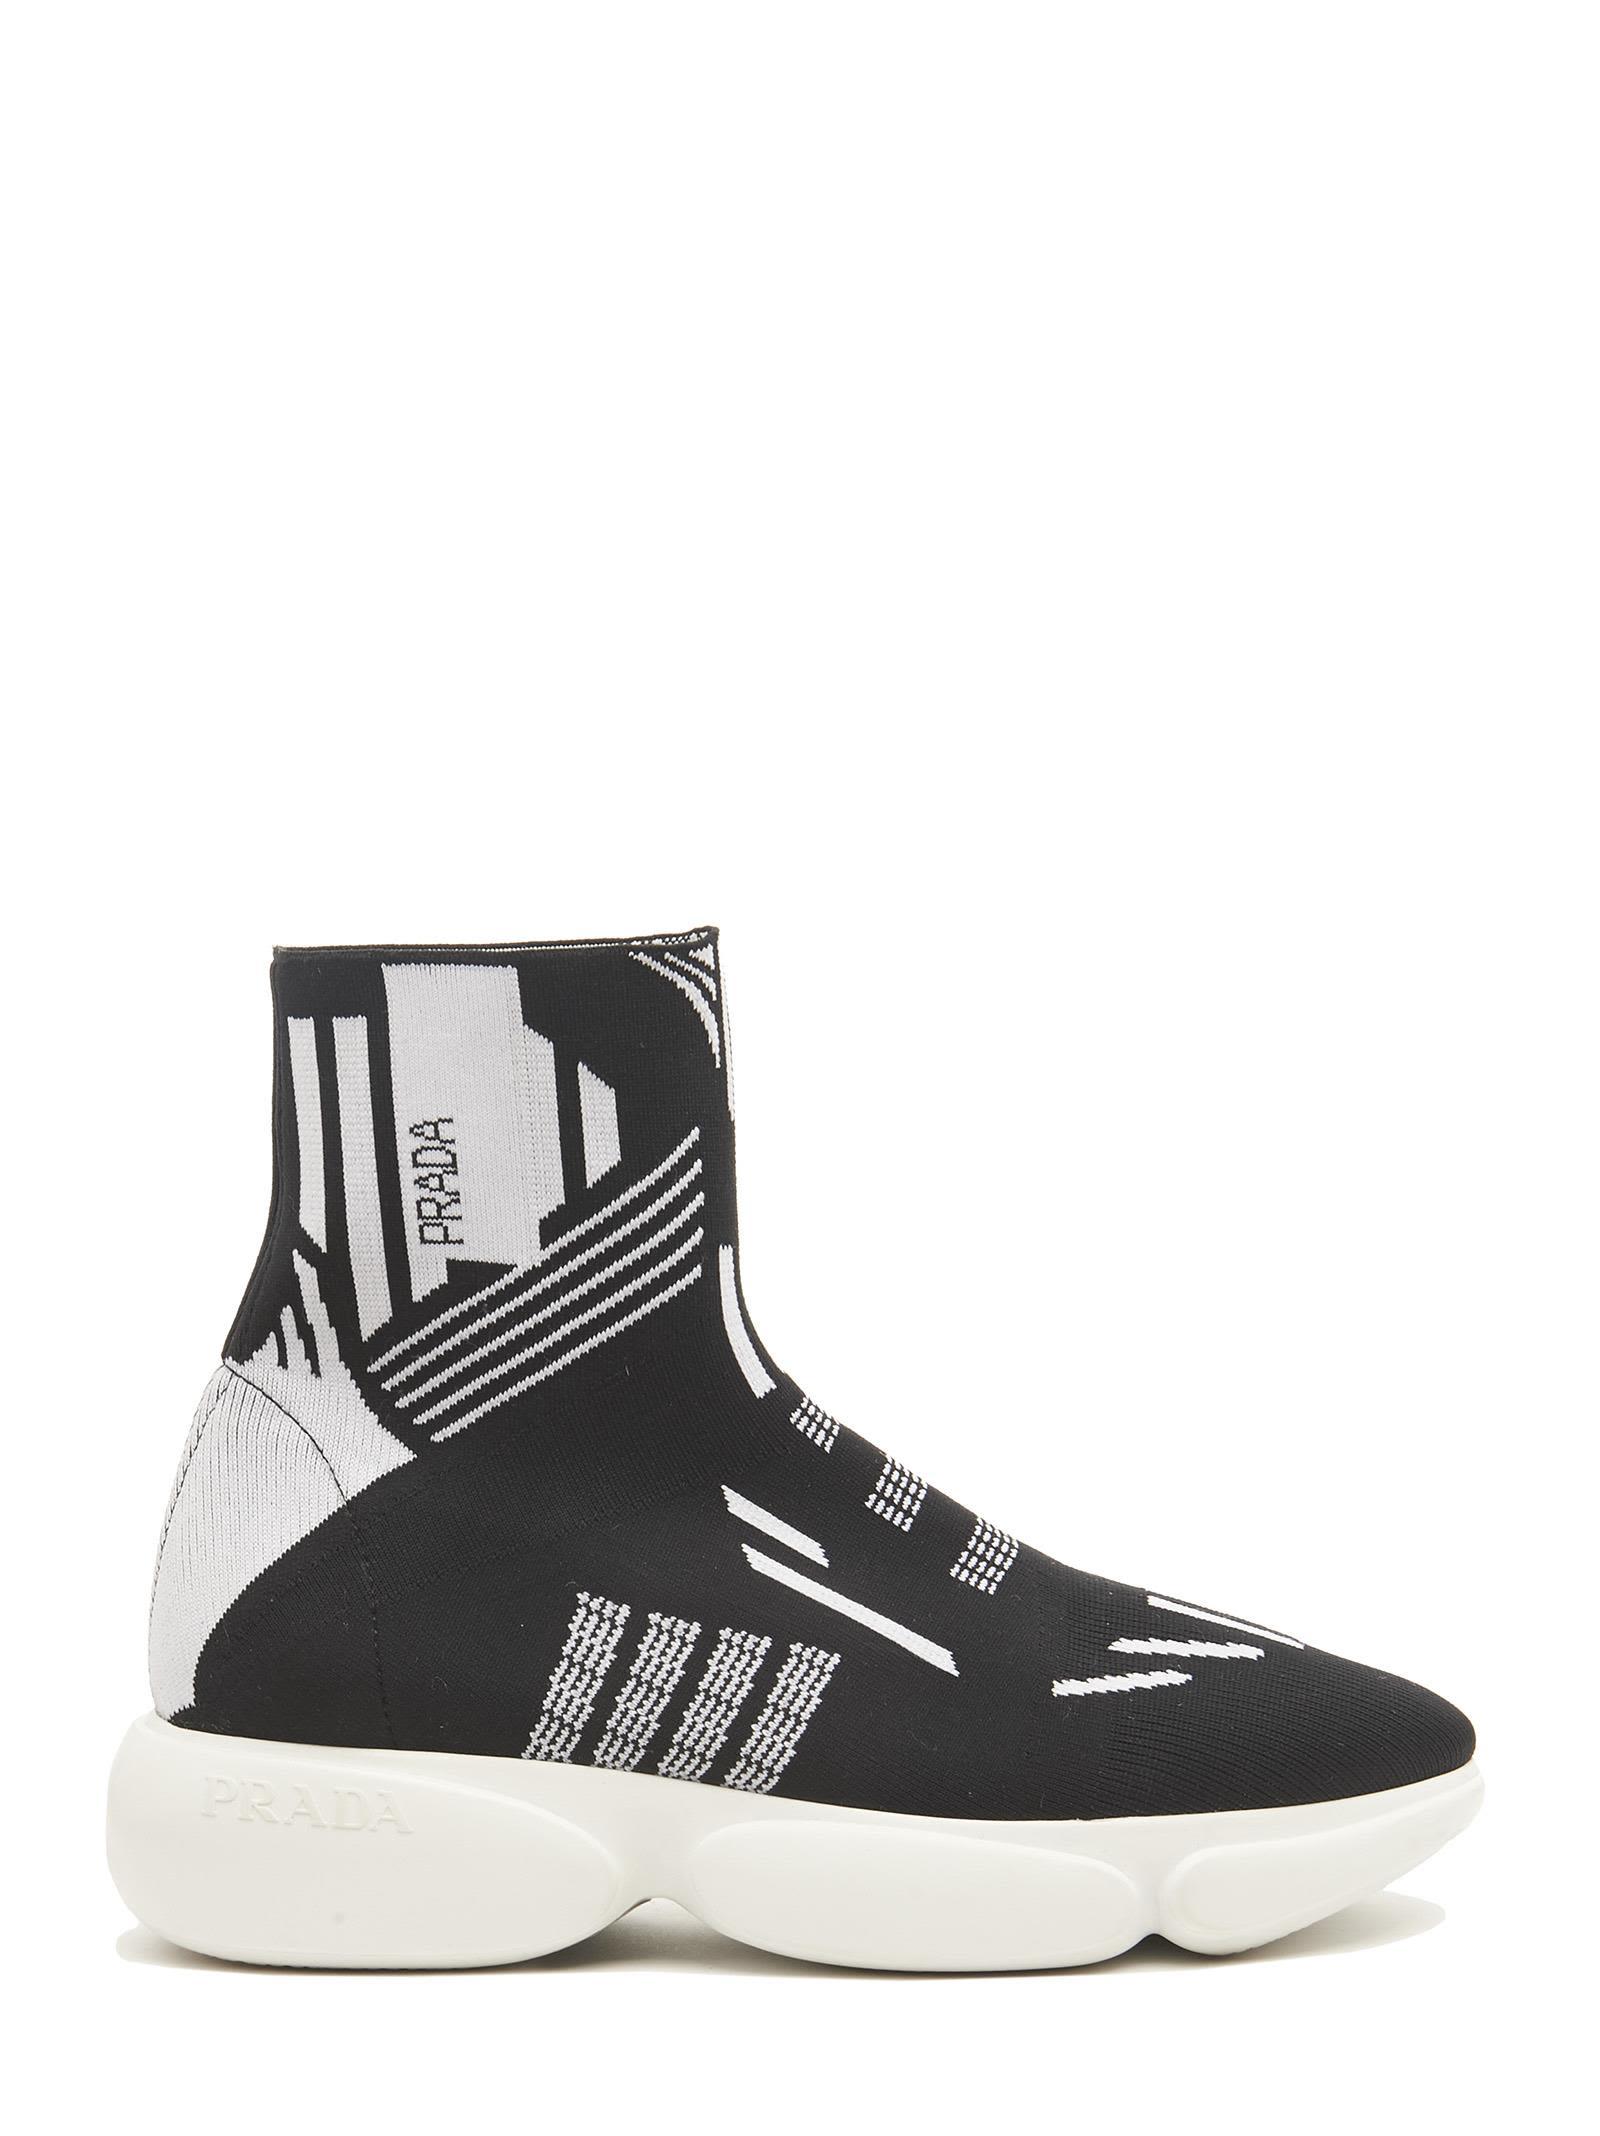 Prada 'cloudbuster' Shoes